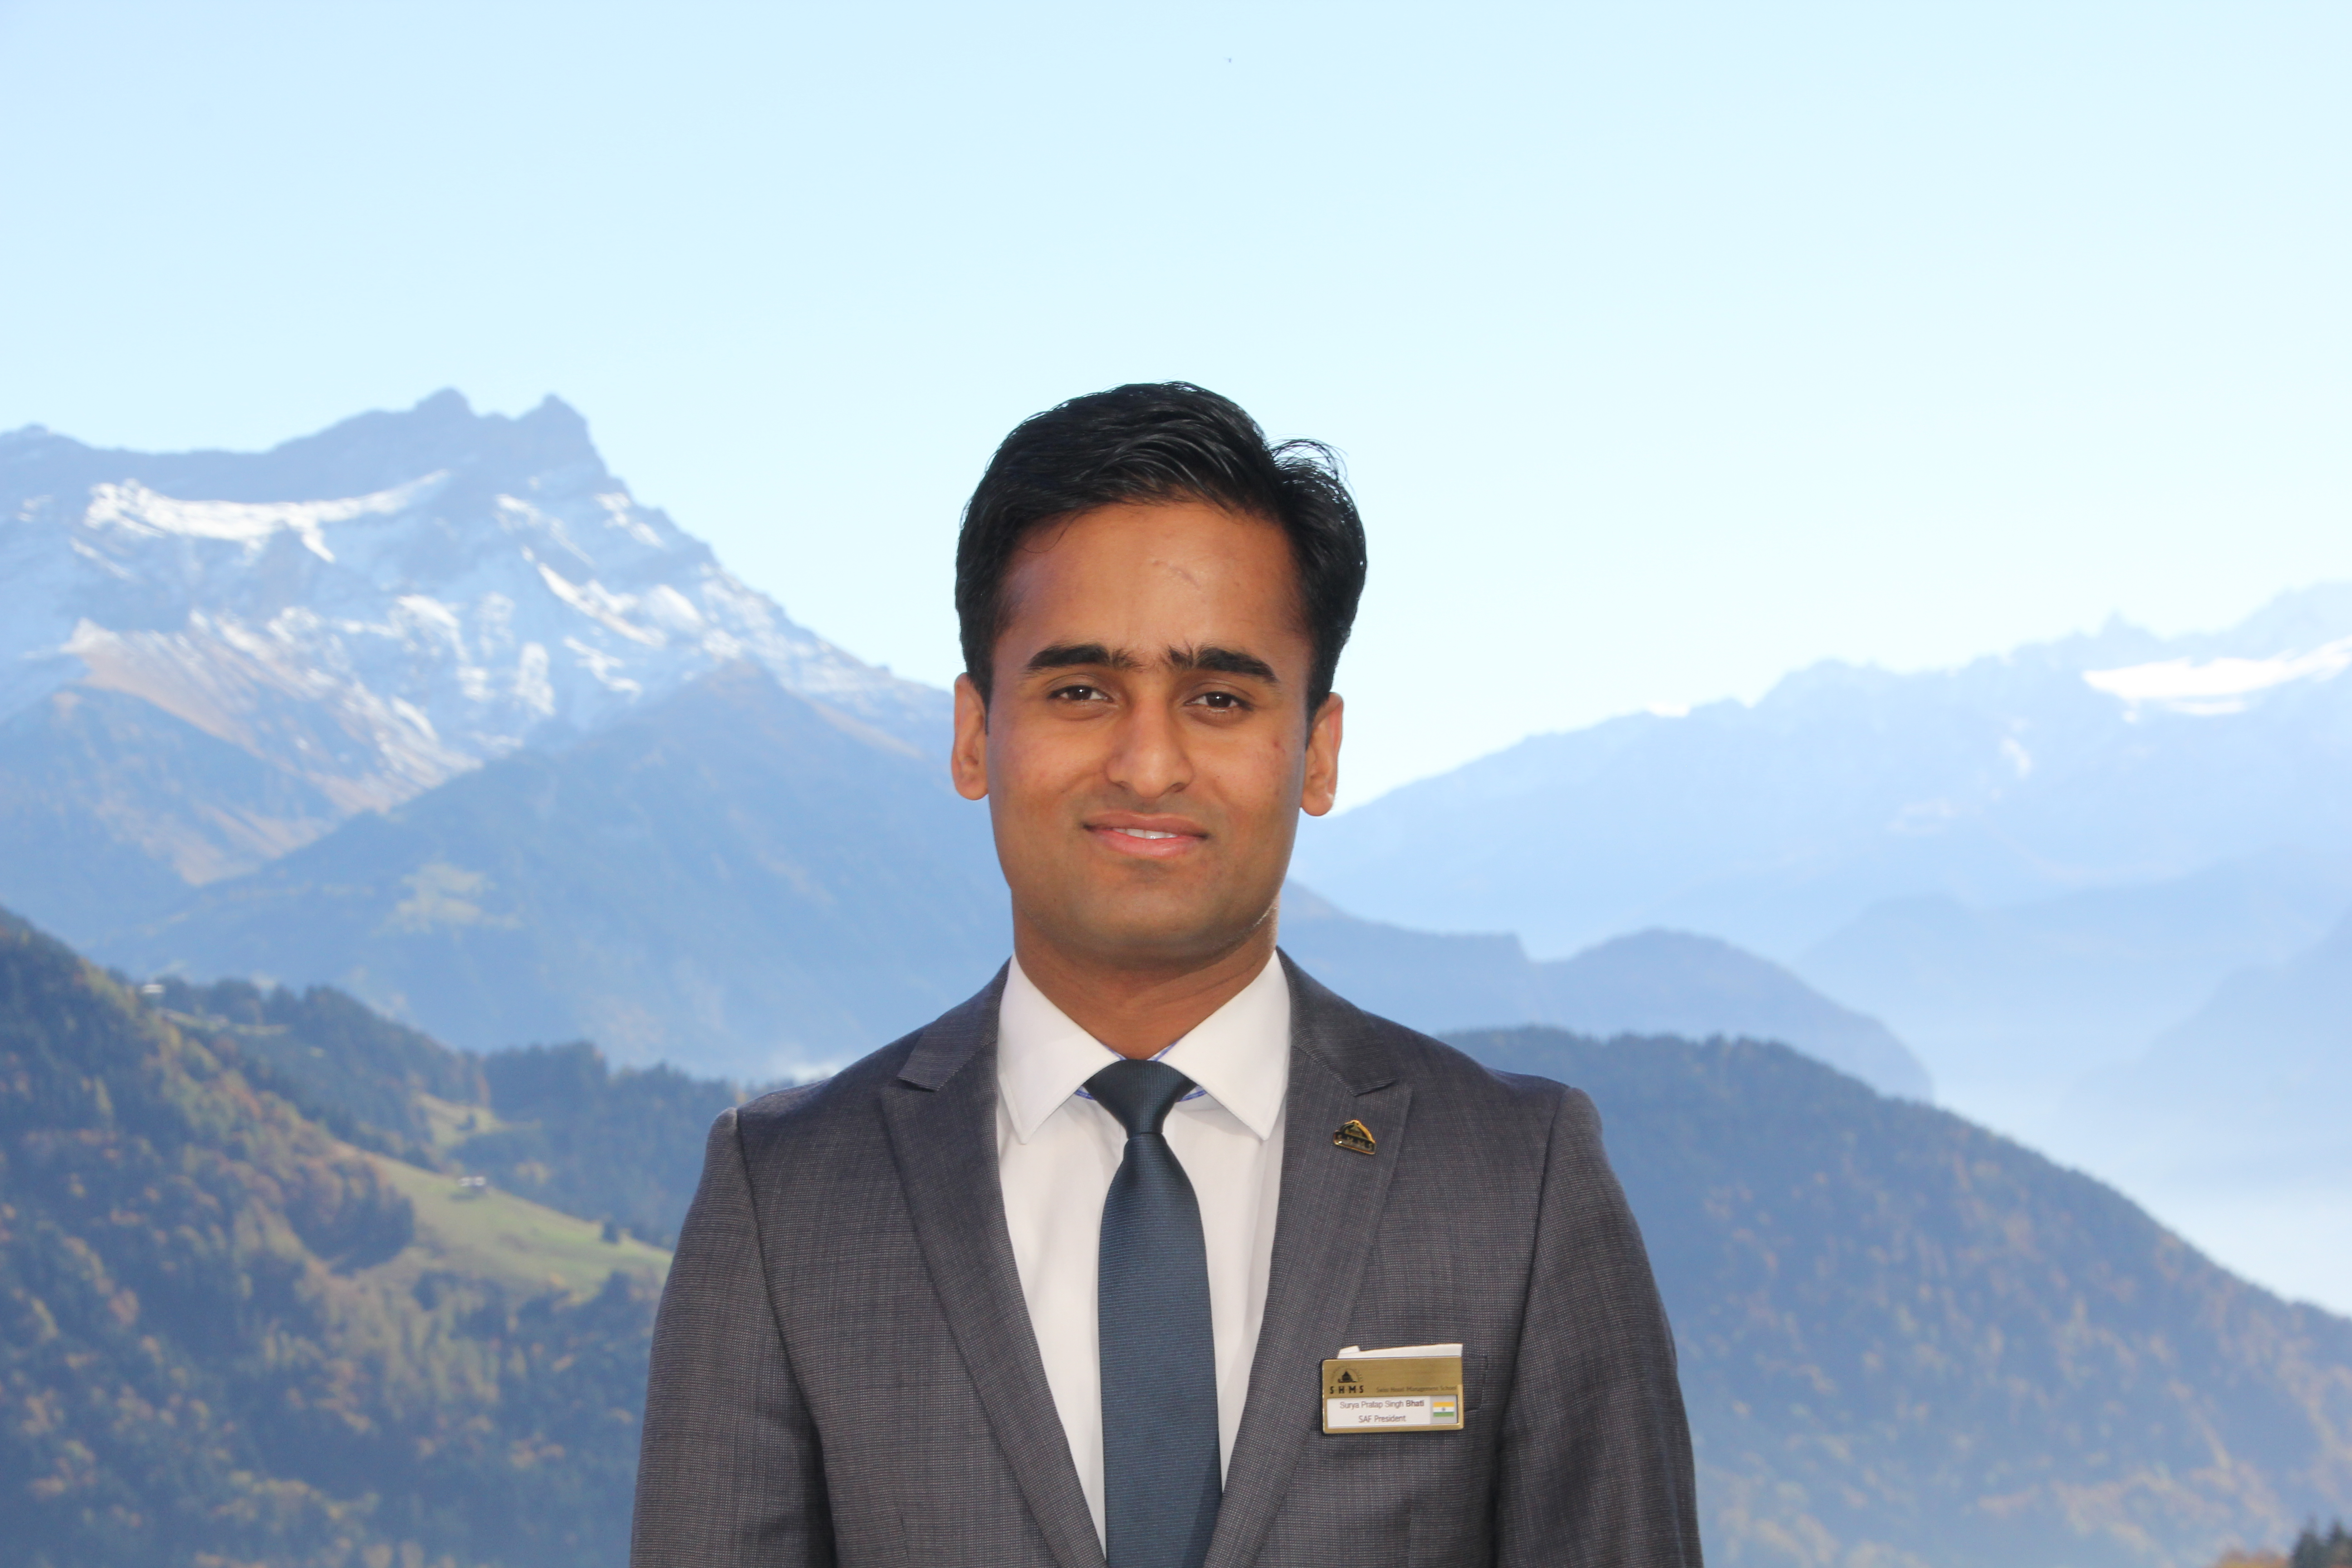 Surya Pratap Singh Bhati, SEG Alumni Ambassador for India